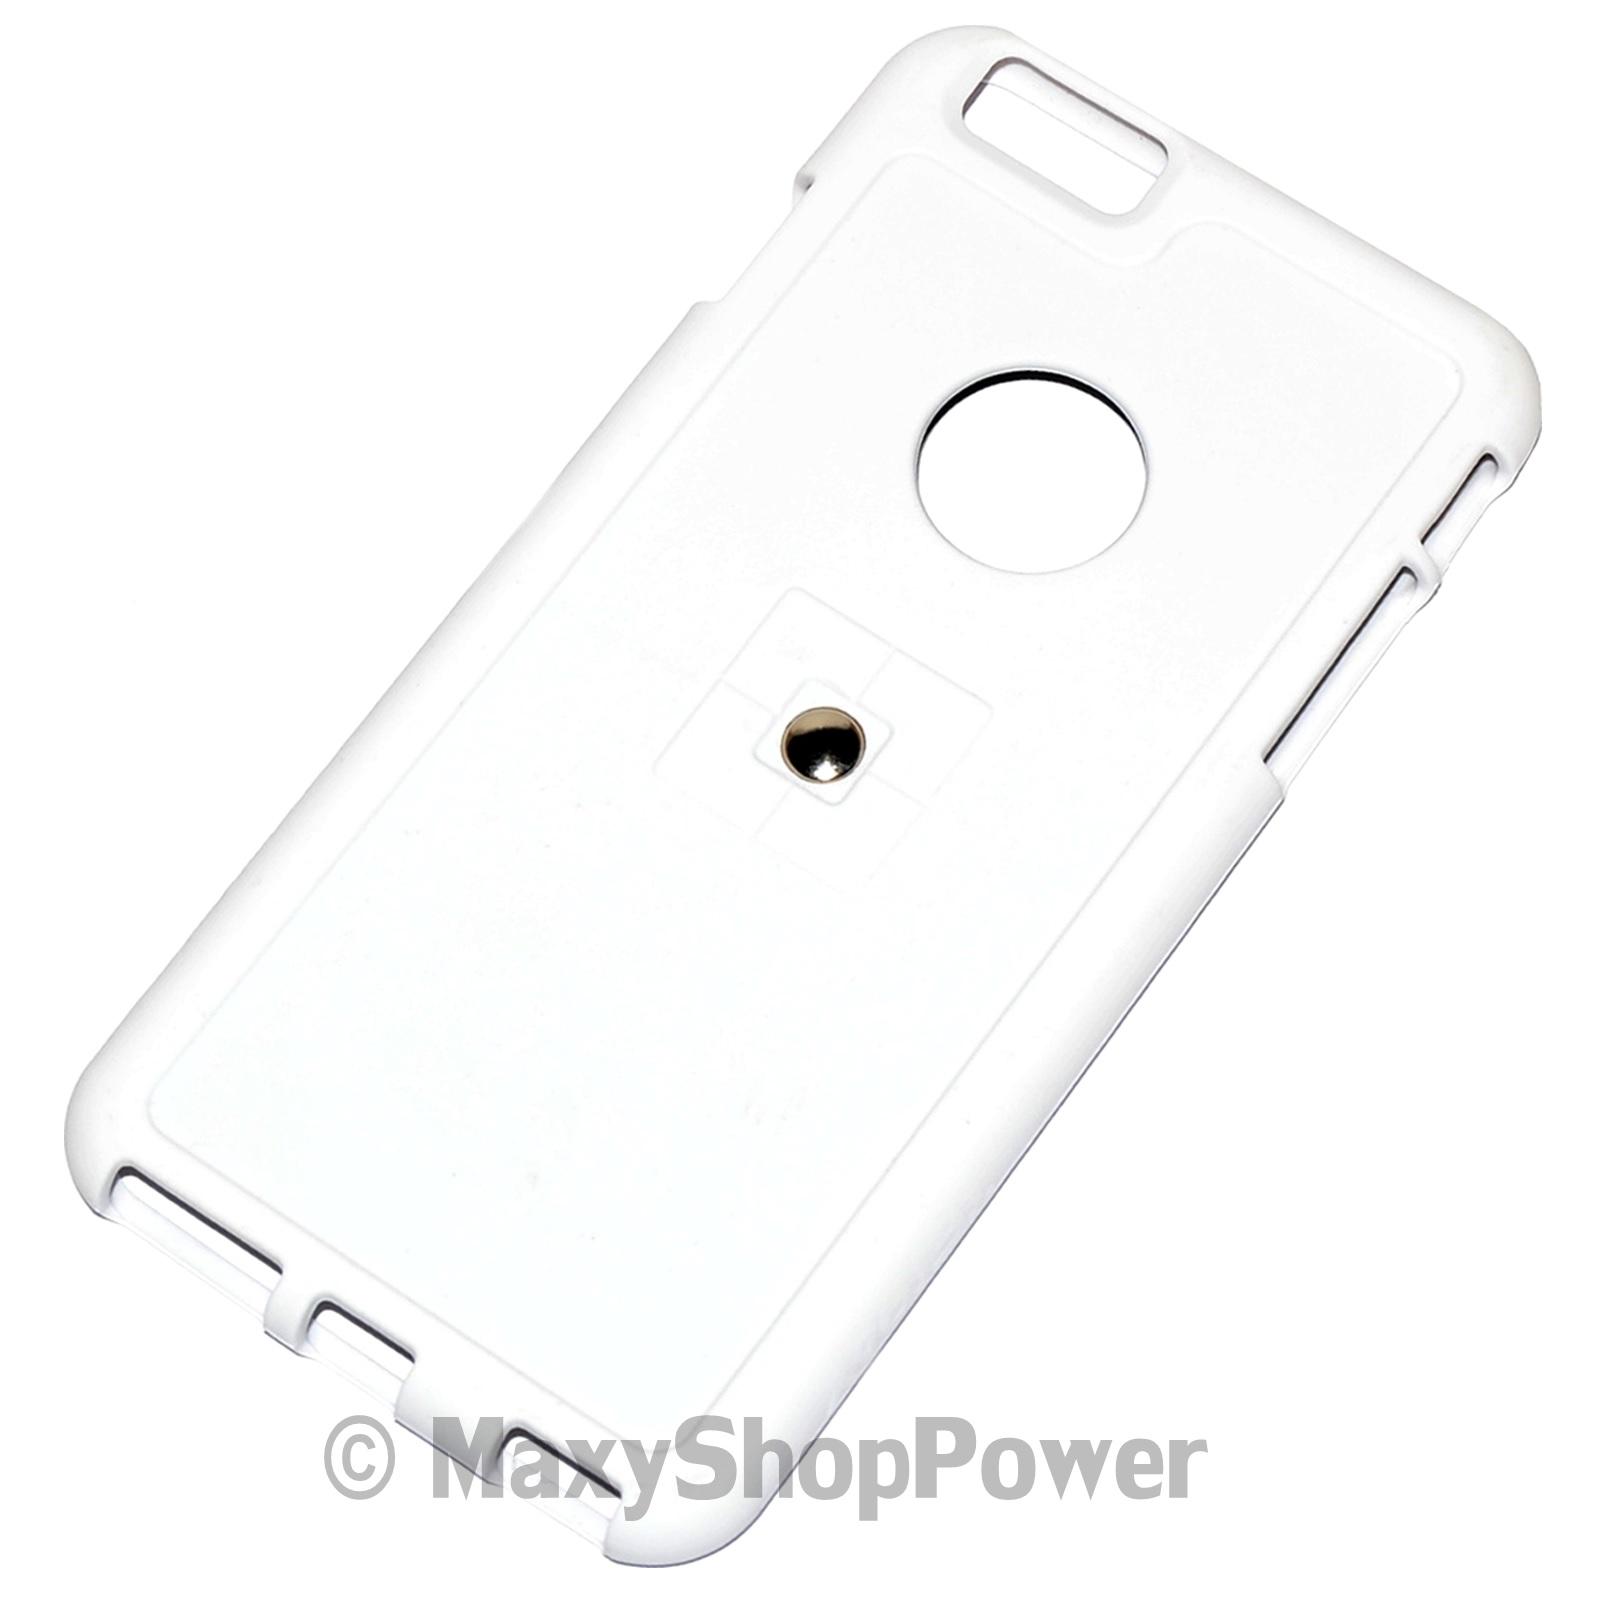 Tetrax Custodia Con Magnete Integrato Xcase Apple Iphone 6